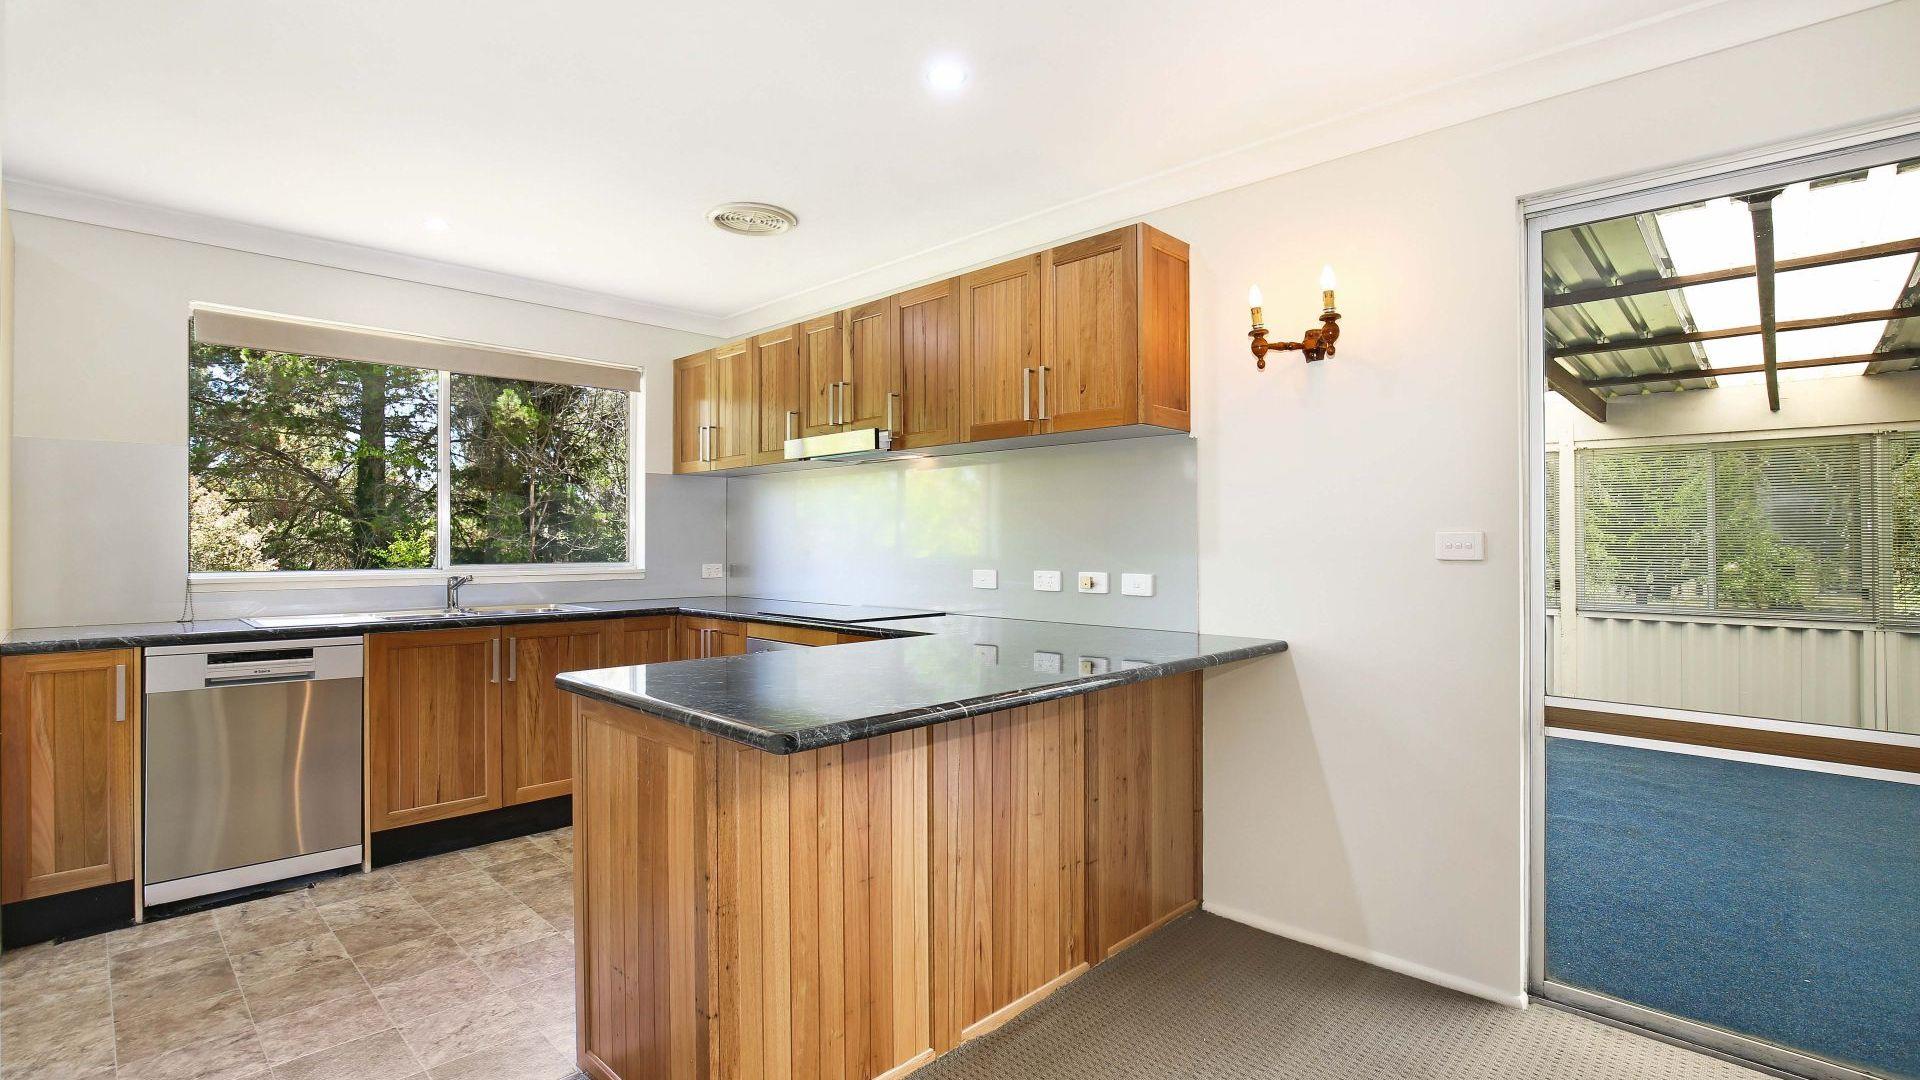 603 Long Swamp Rd, Armidale NSW 2350, Image 1